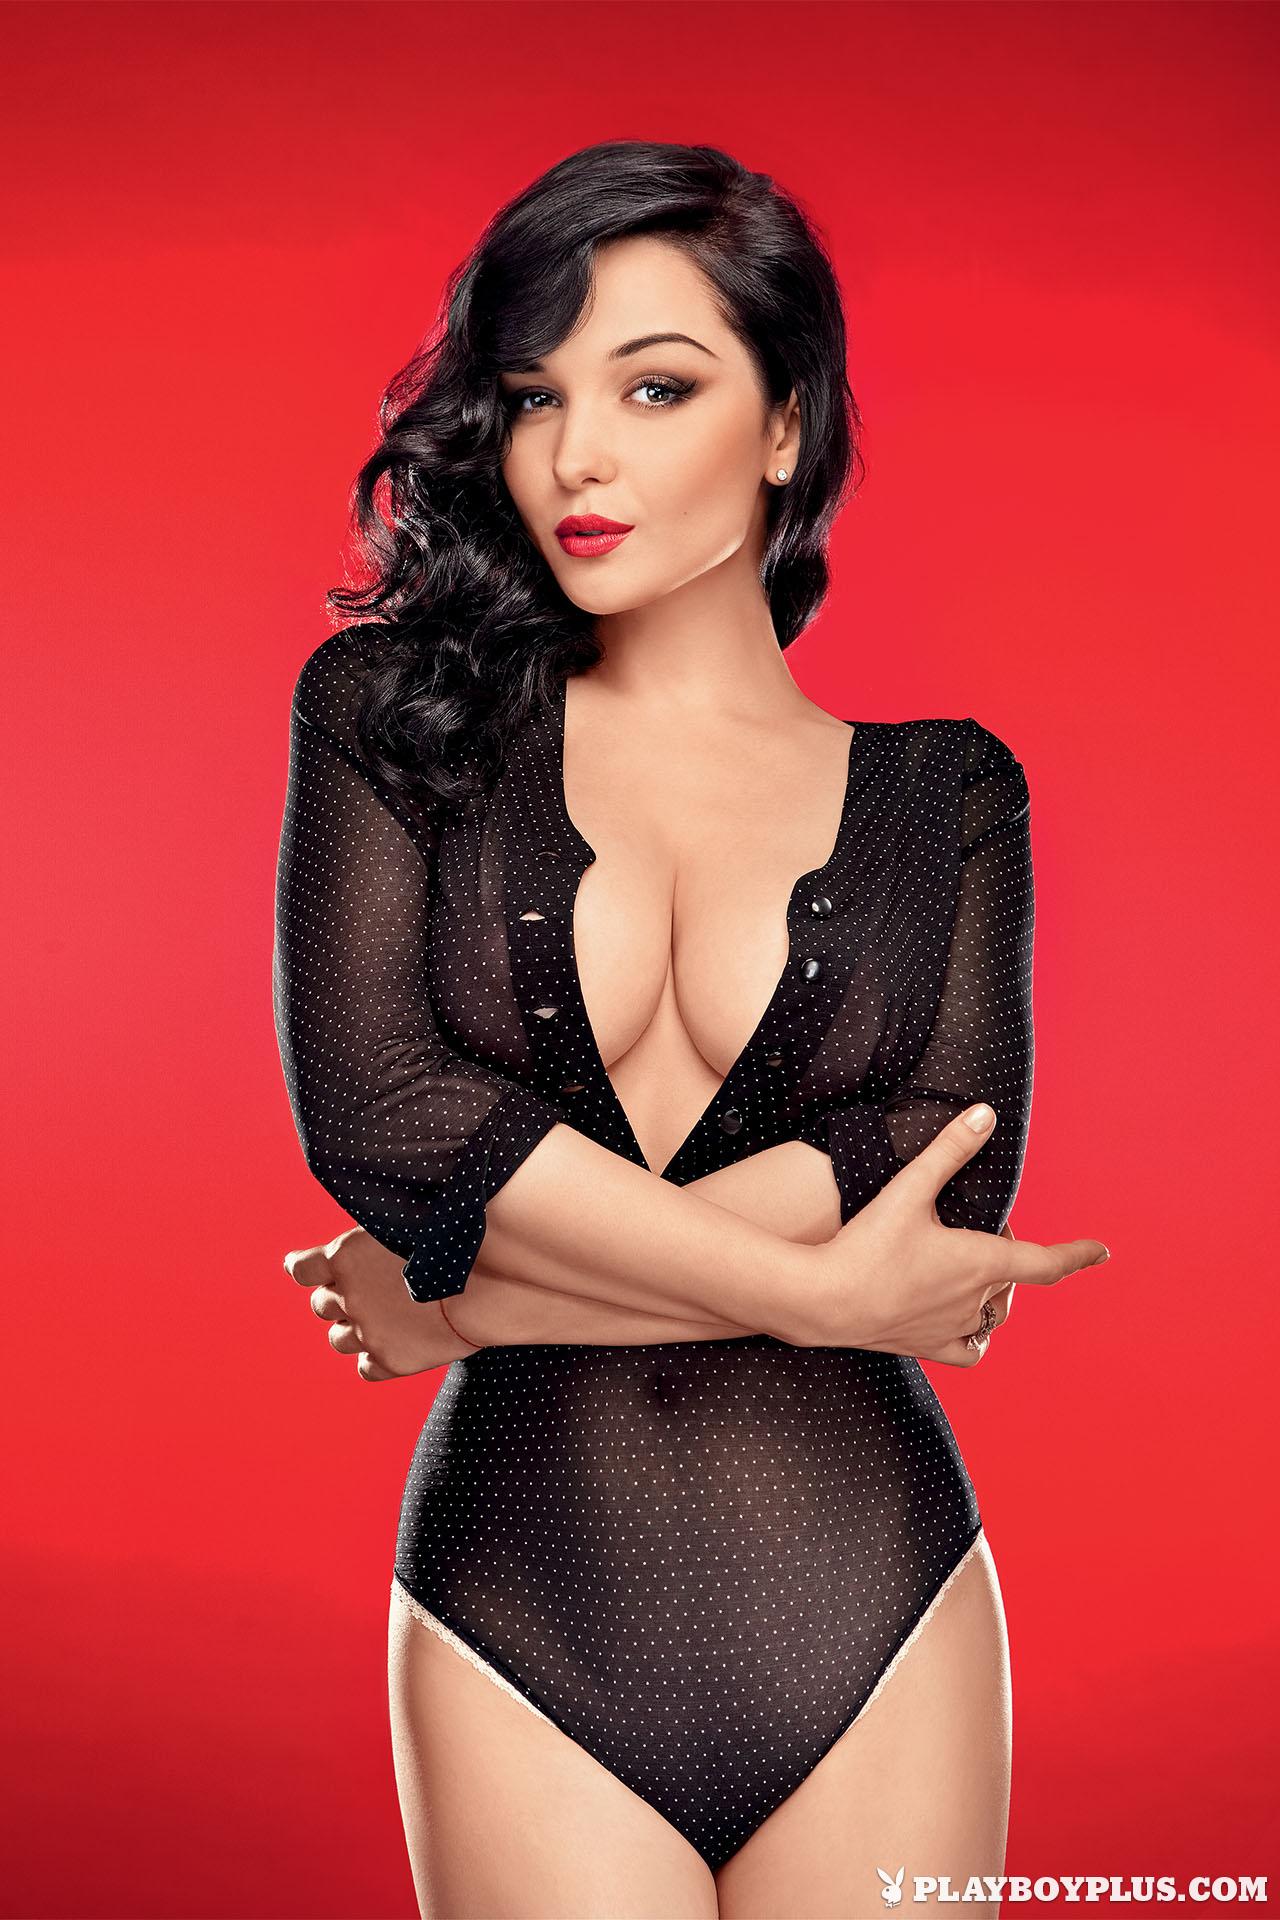 Sexy woman i met online dating site9 Part 2